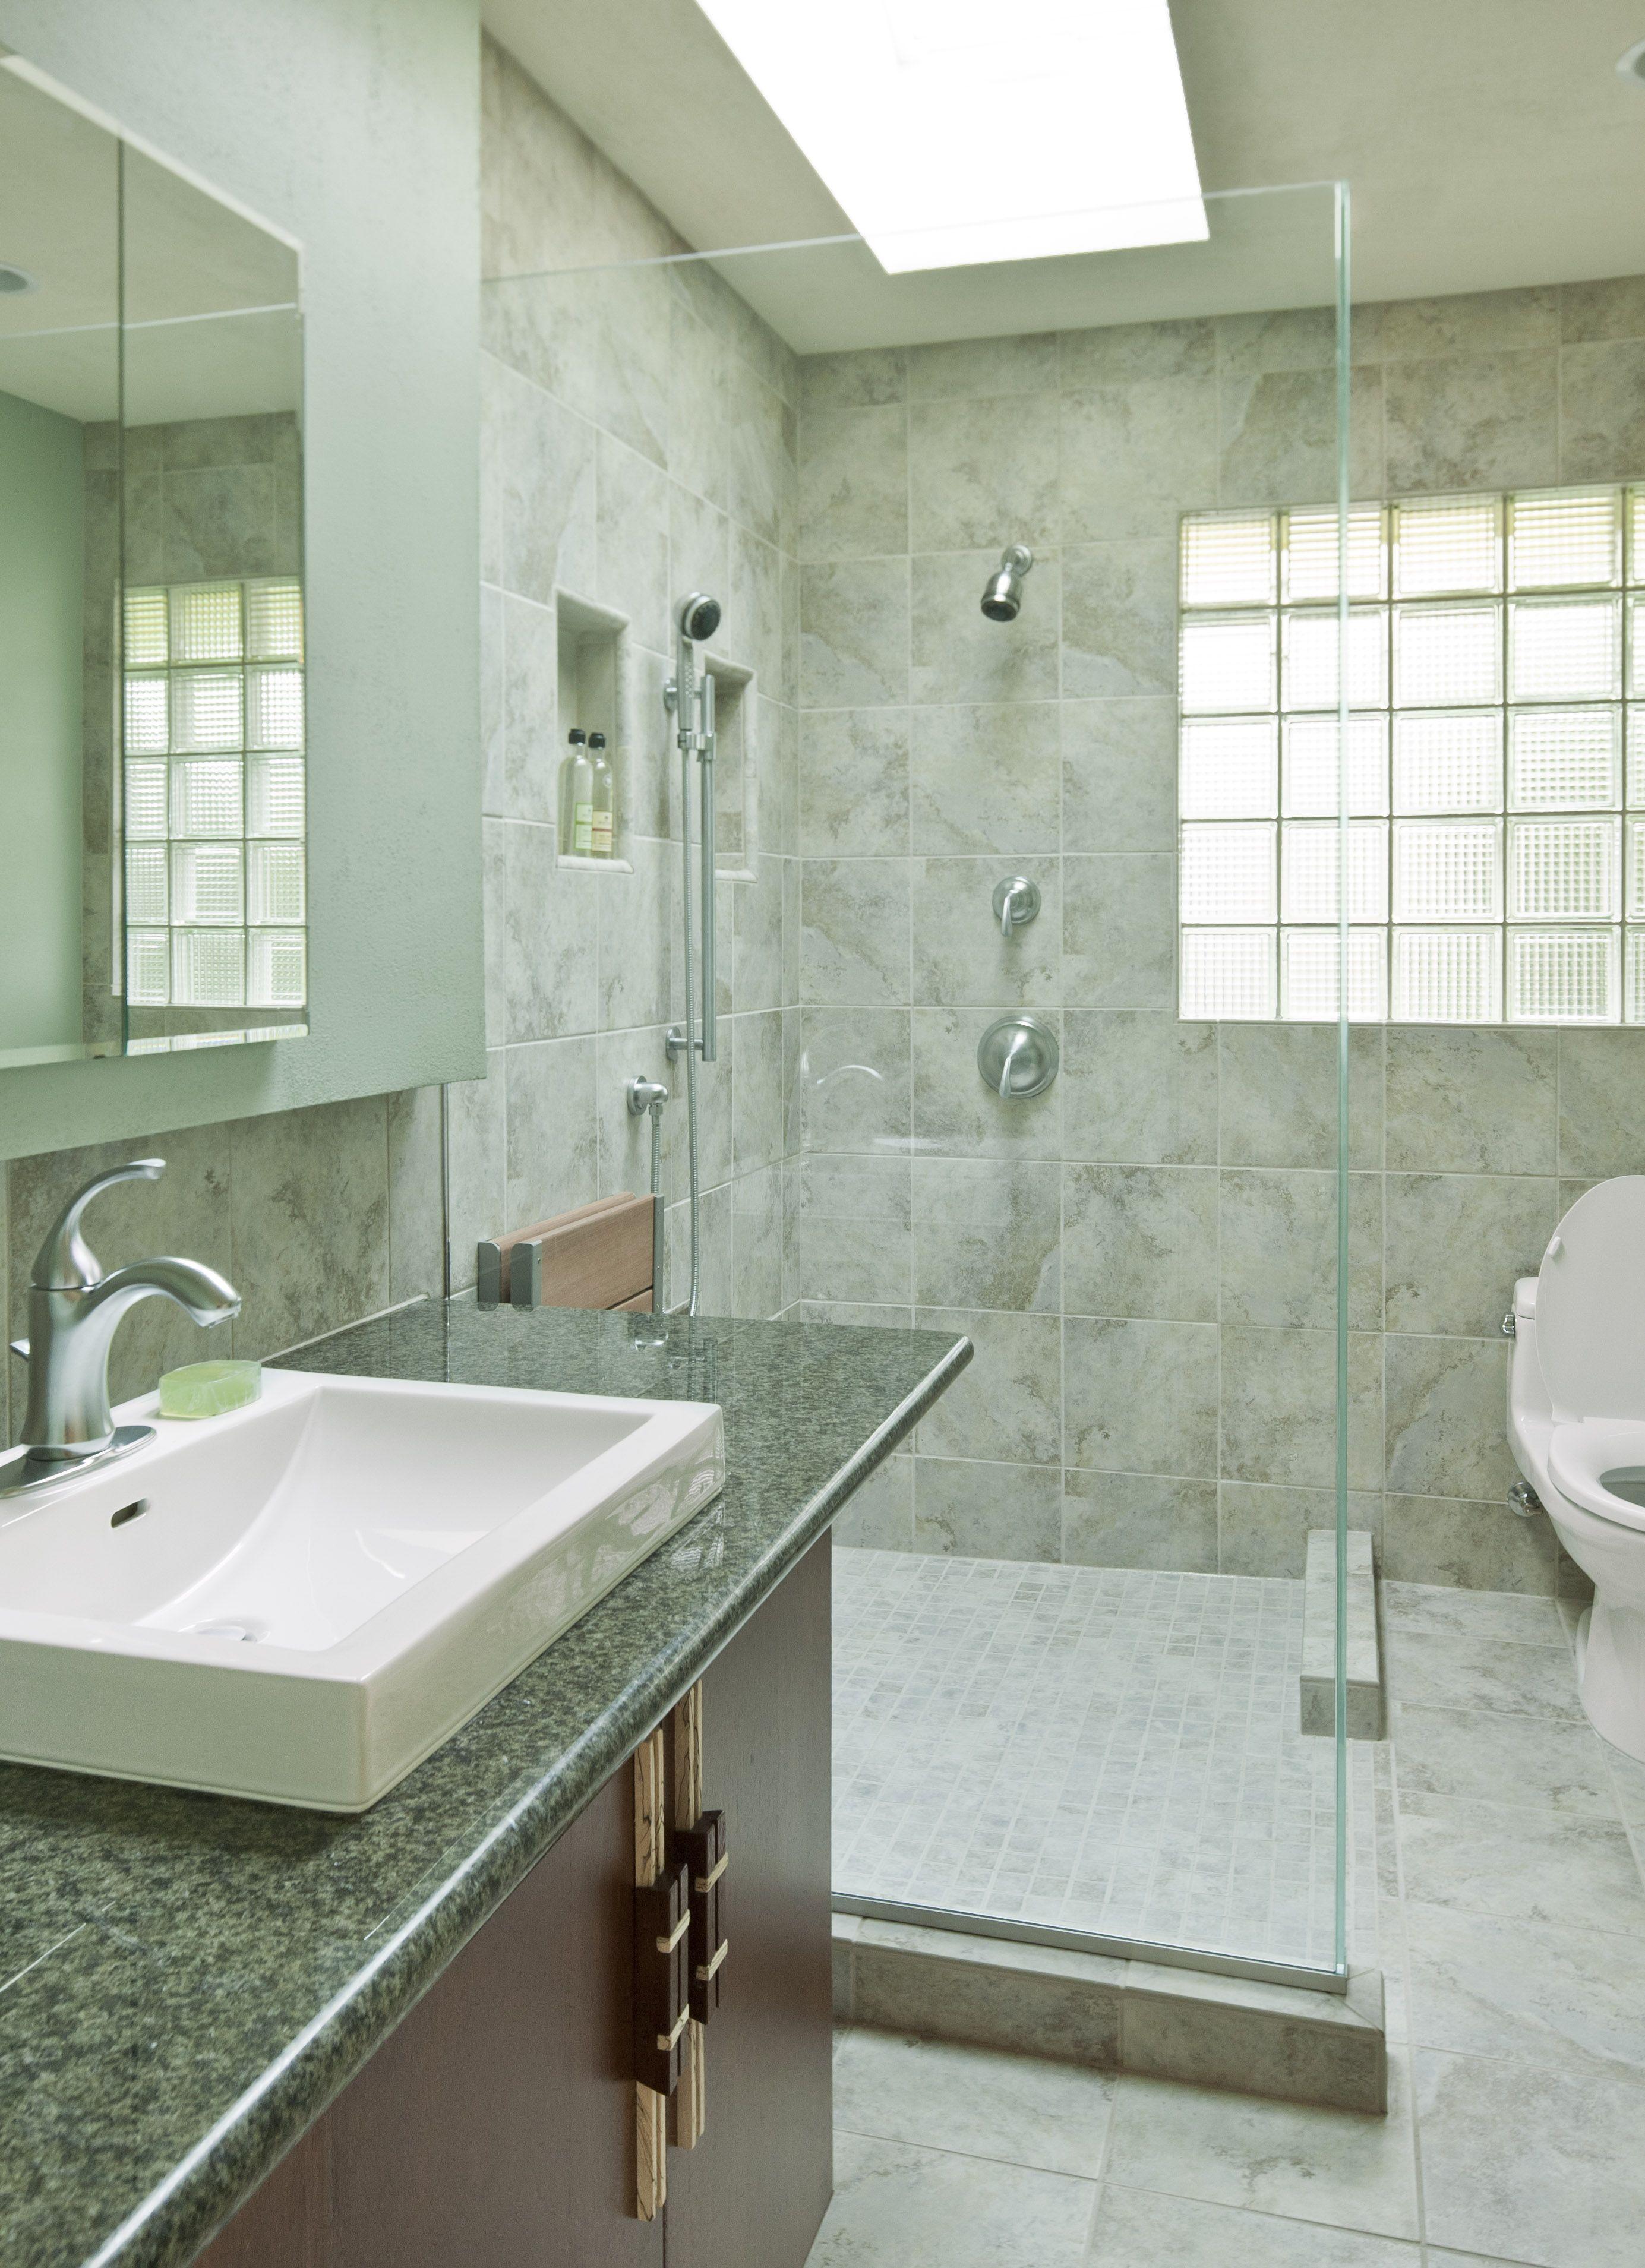 Calming Green Bathroom With Shower  Model Remodel Seattle Wa Interesting Bathroom Remodel Seattle Design Decoration